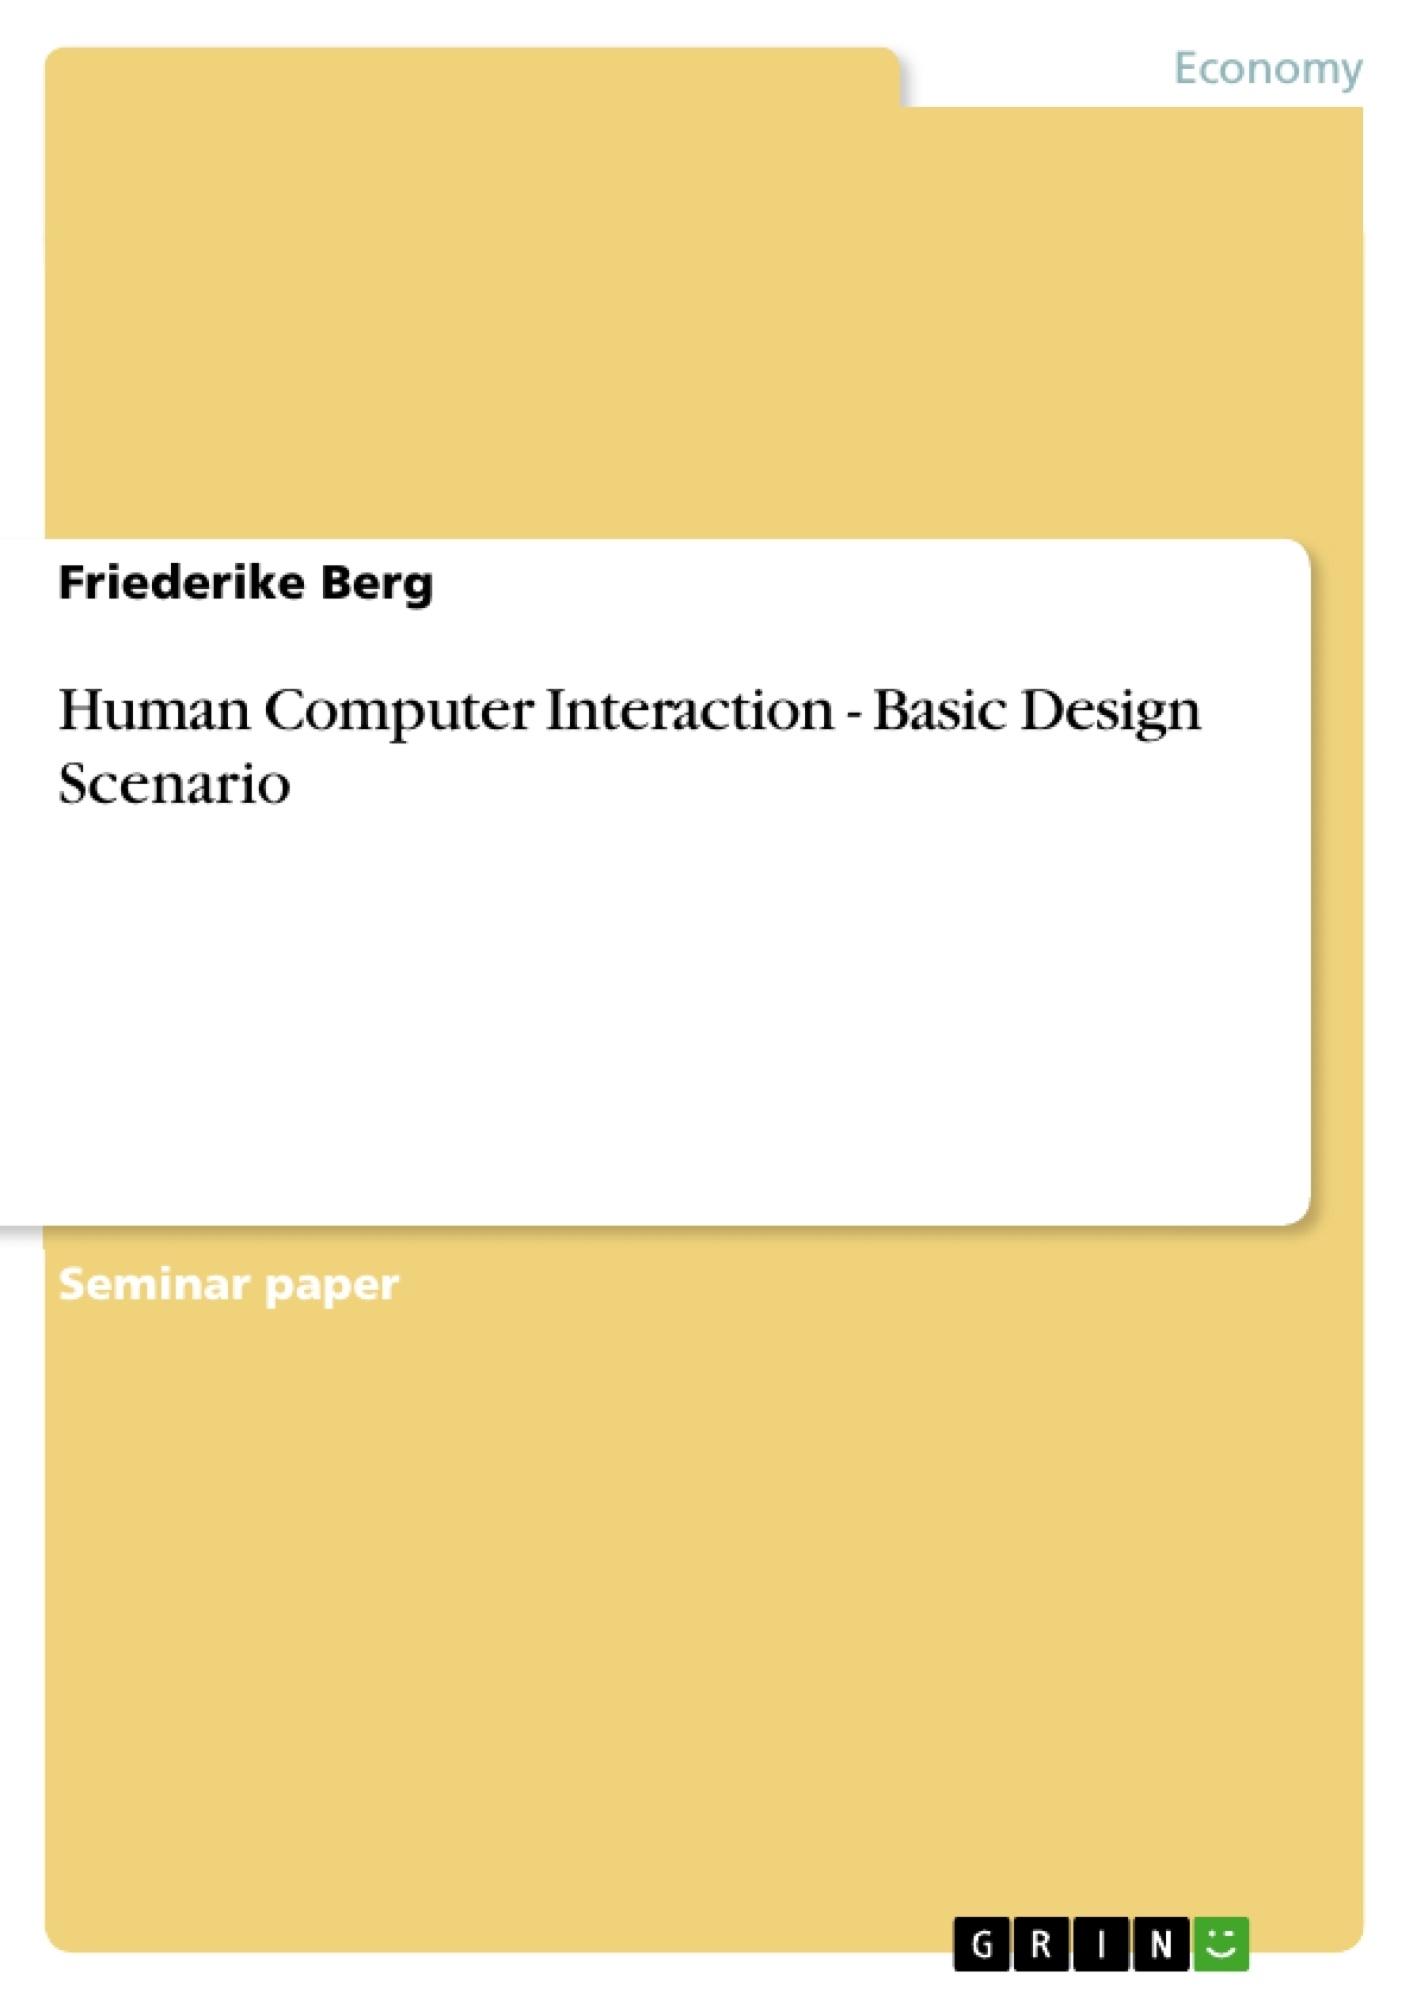 Title: Human Computer Interaction - Basic Design Scenario